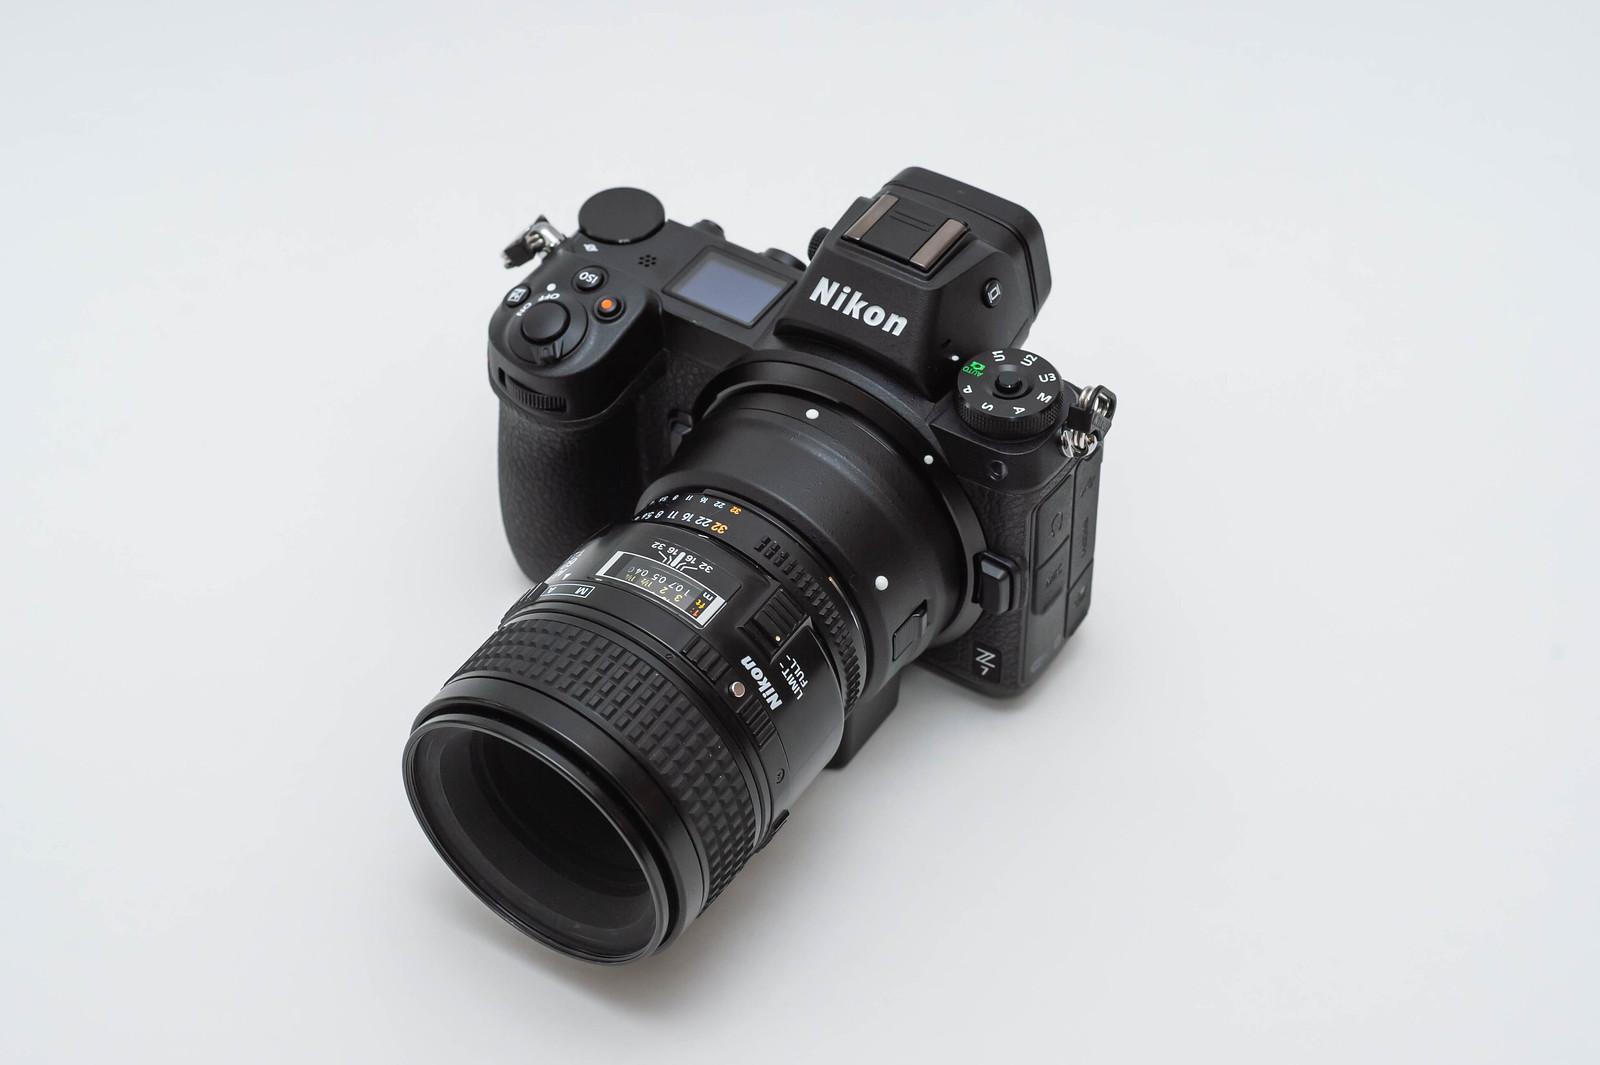 Nikon Z7 + FTZ + AF Micro-Nikoor 60mm F2.8D